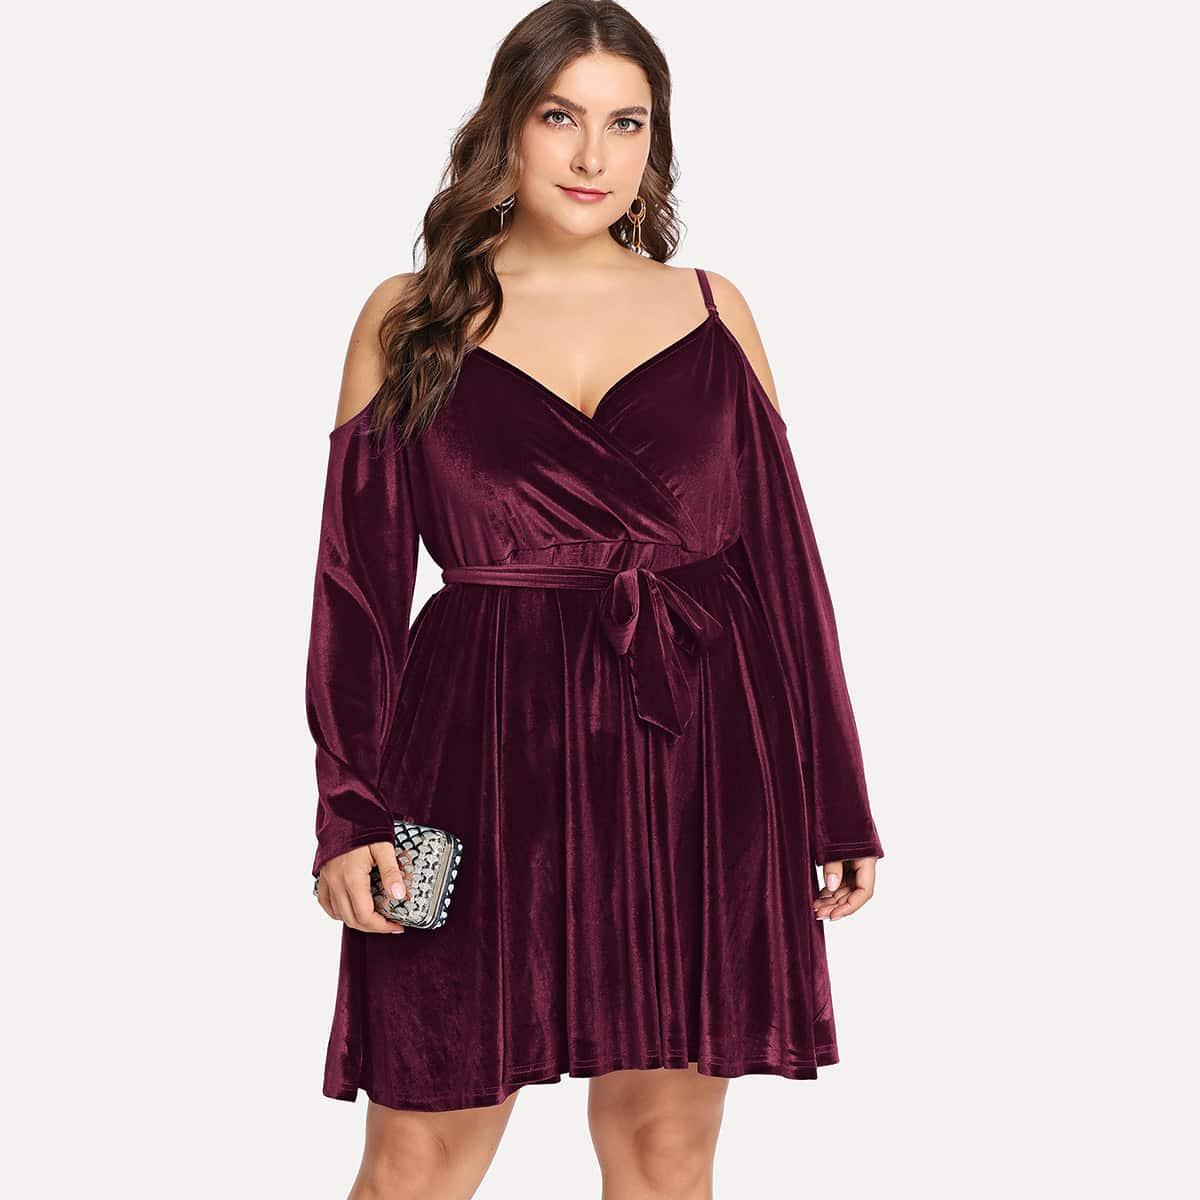 Bordeaux Elegant Vlak Grote maten jurken Riem